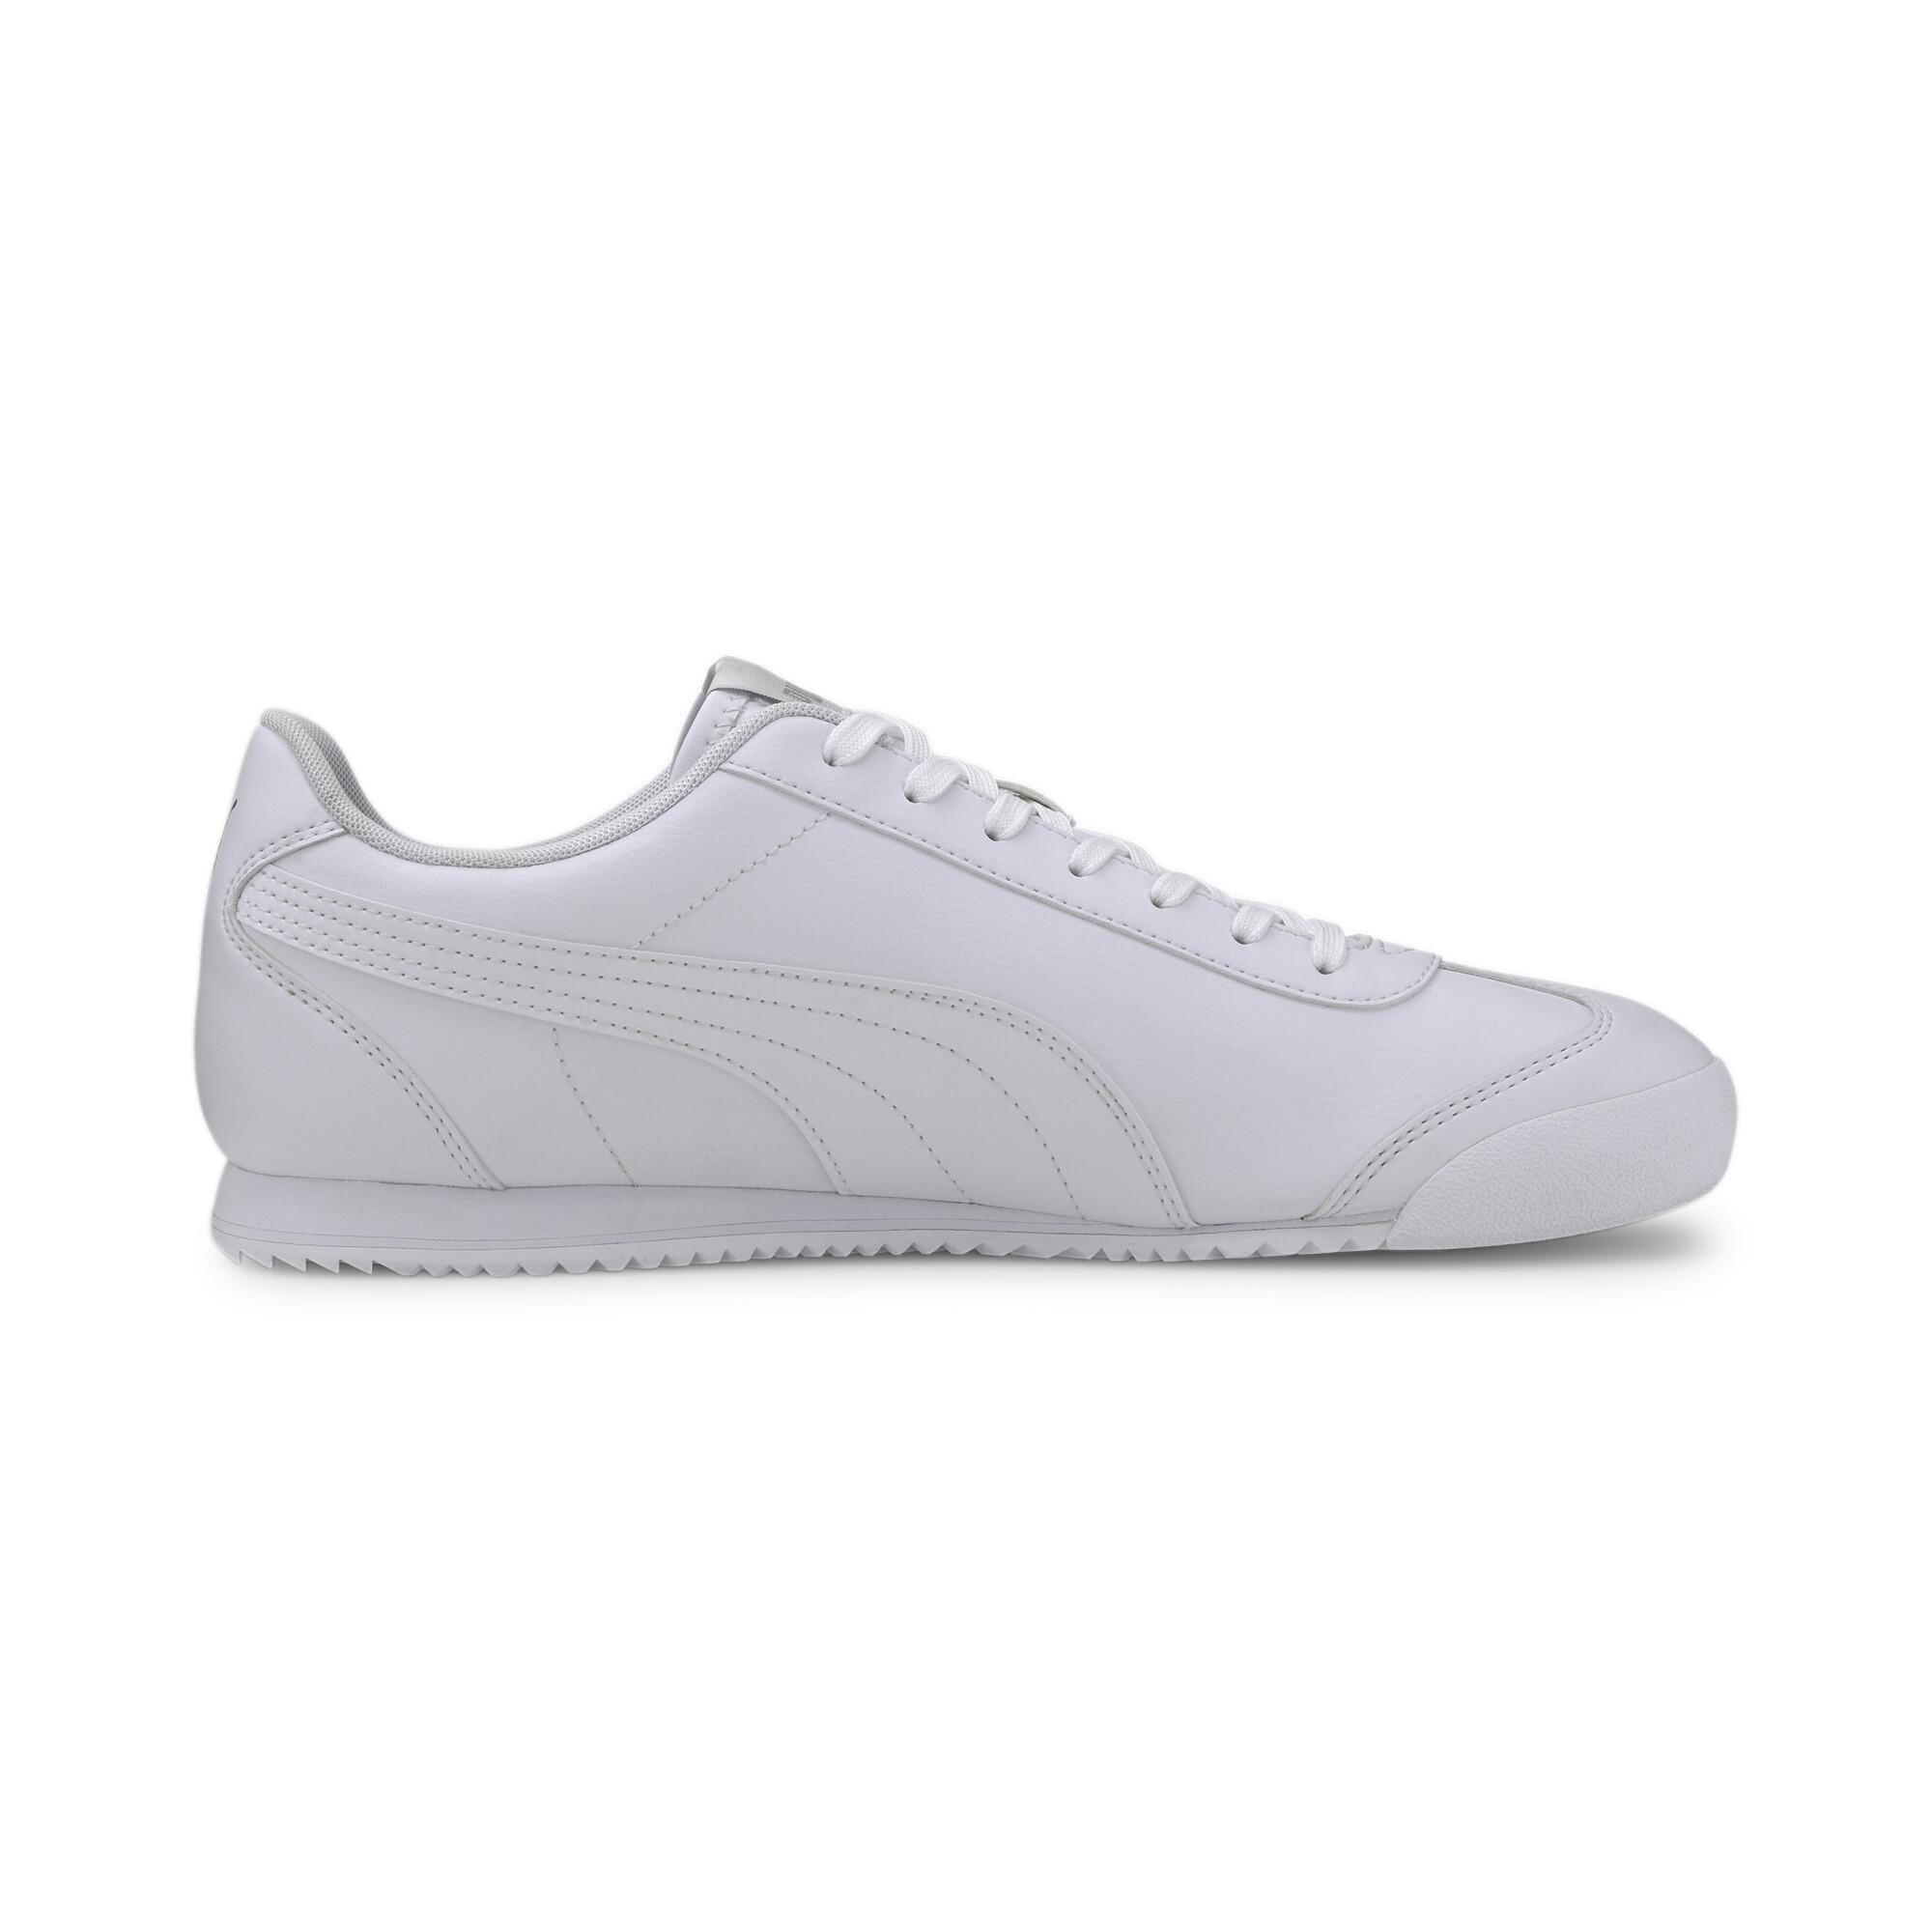 PUMA-Men-039-s-Turino-SL-Sneakers thumbnail 7